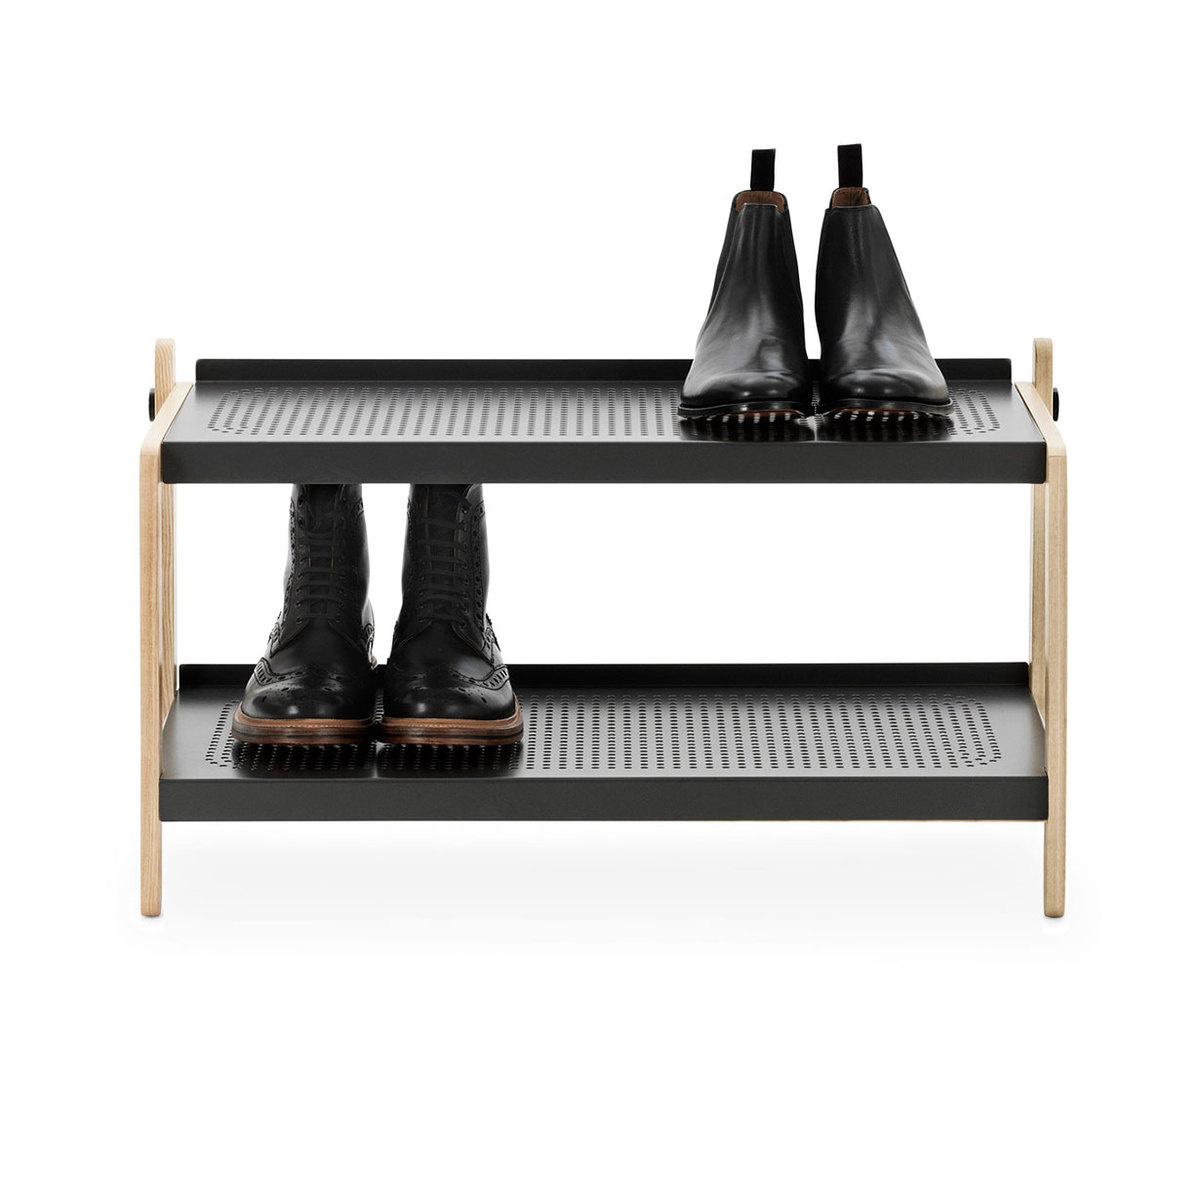 c4322a15277 Sko shoe rack by Normann Copenhagen | LOVEThESIGN